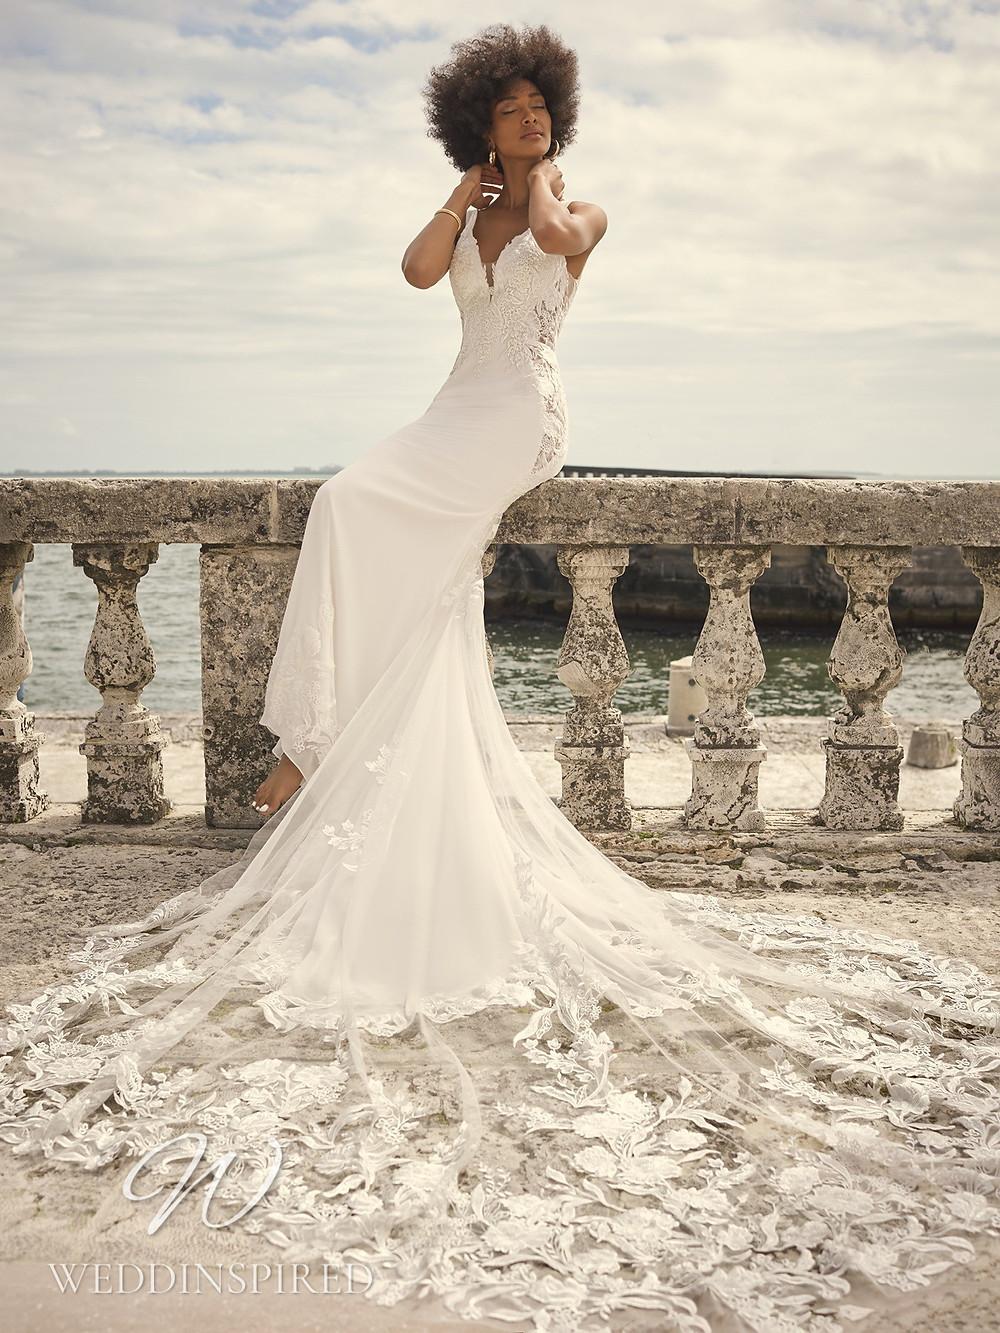 A Sottero & Midgley 2021 lace and satin mermaid wedding dress